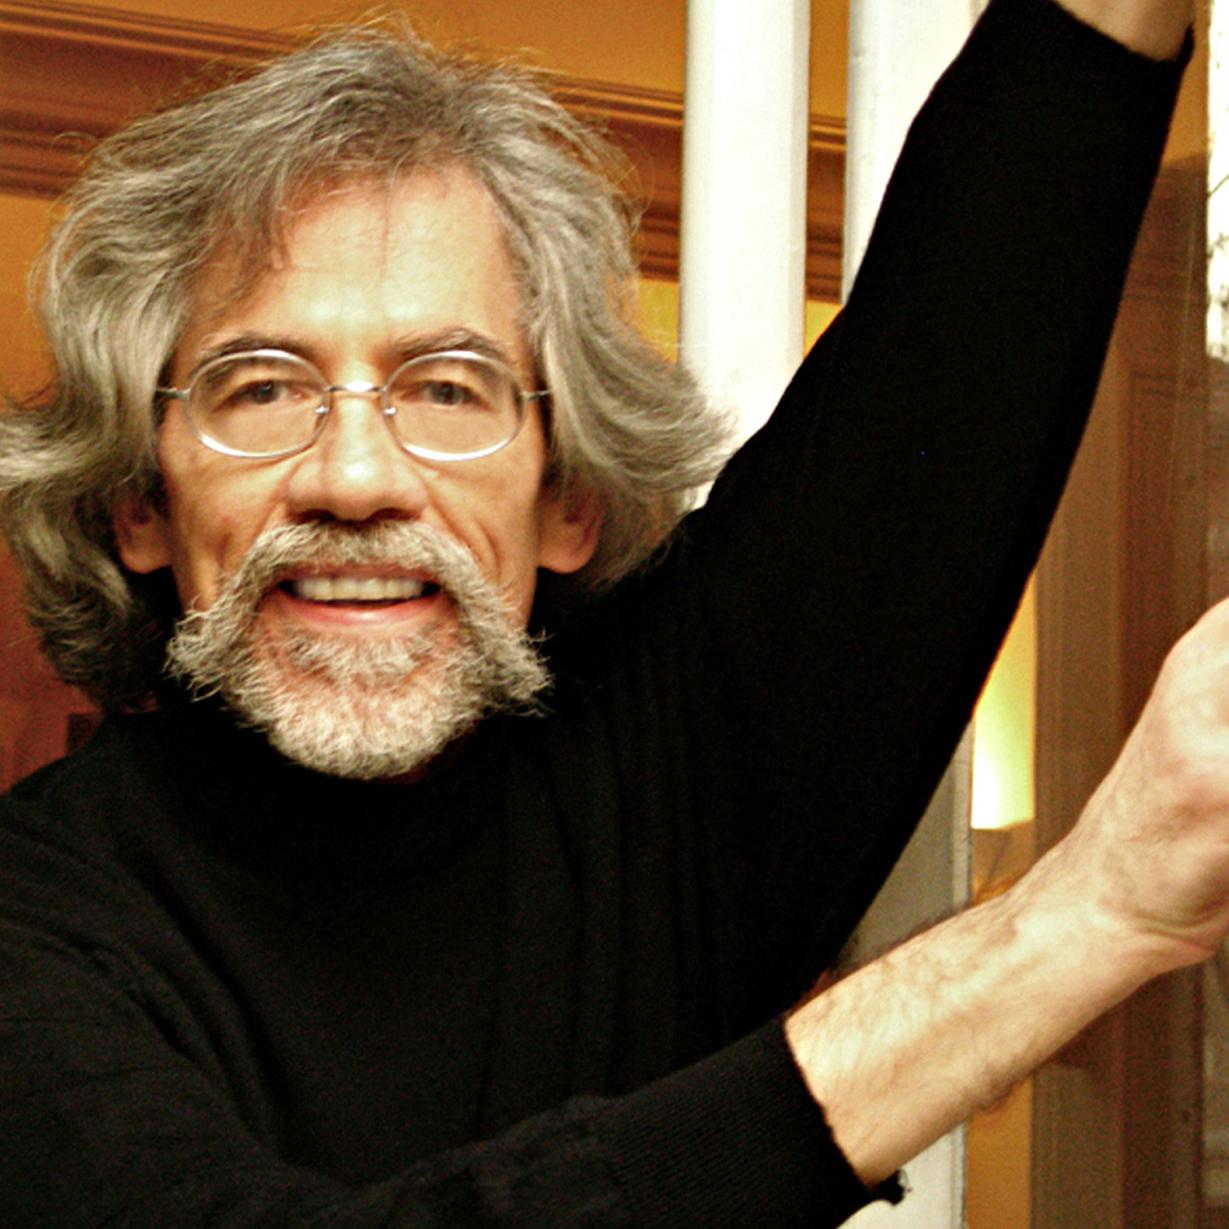 Jean-François Vautrin